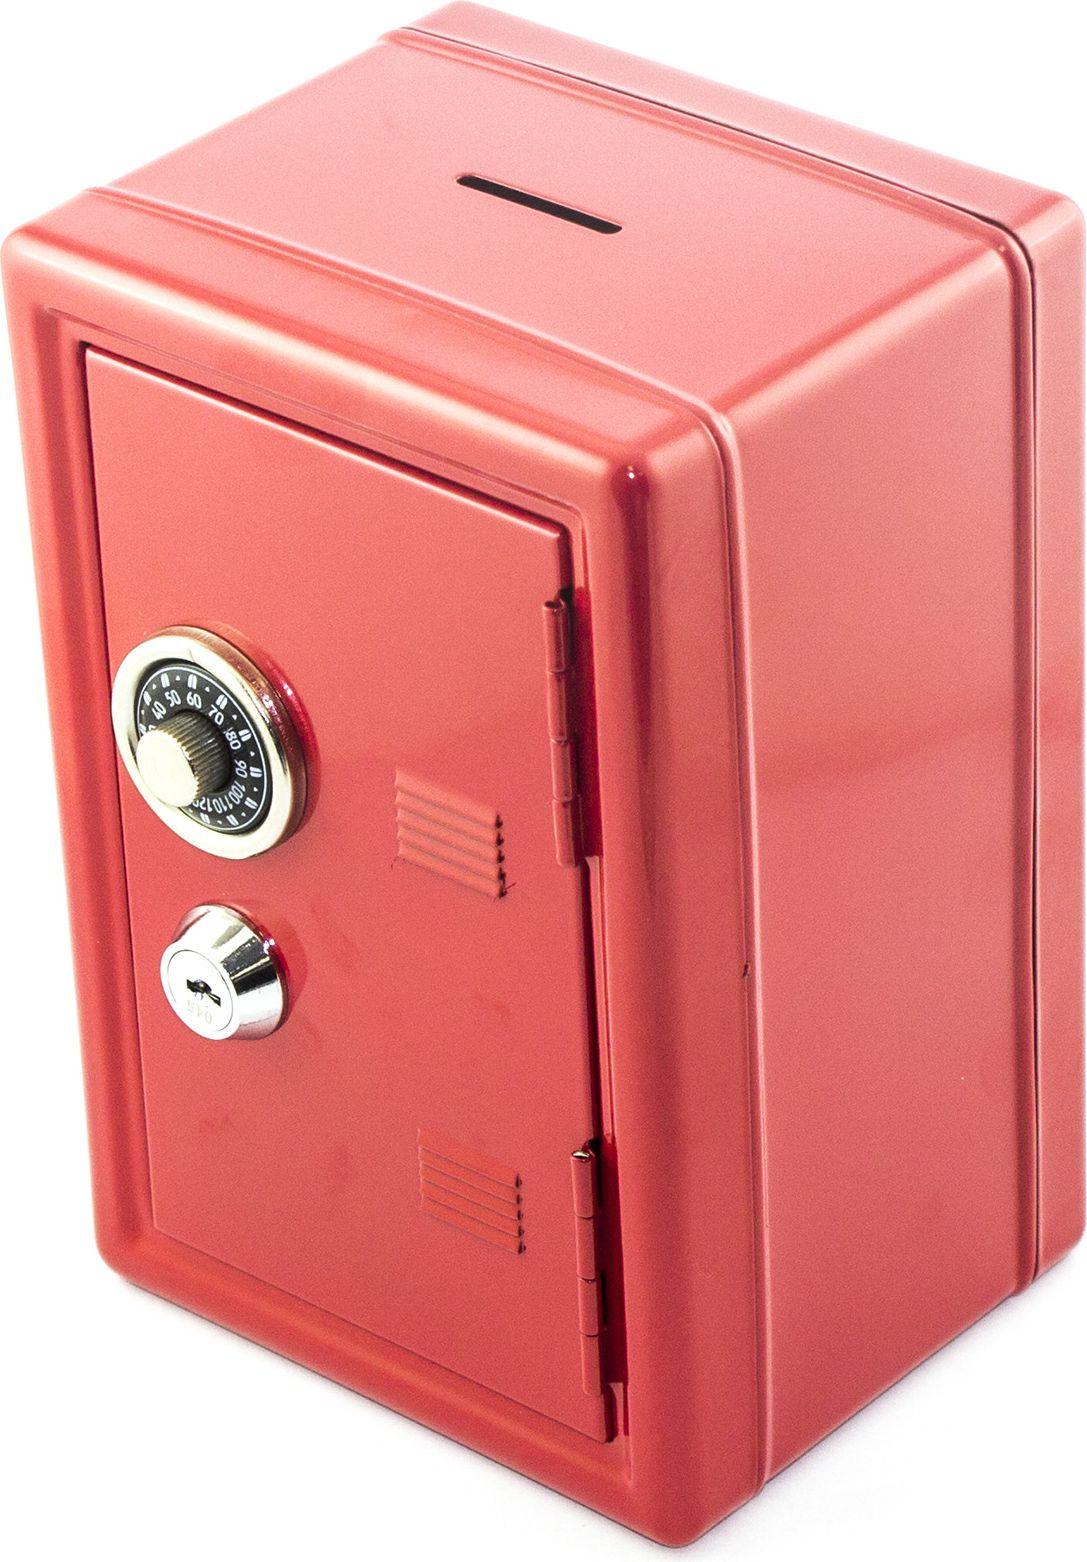 "Копилка Эврика ""Сейф"", с ключом, цвет: красный, 12 х 17,5 х 10 см"